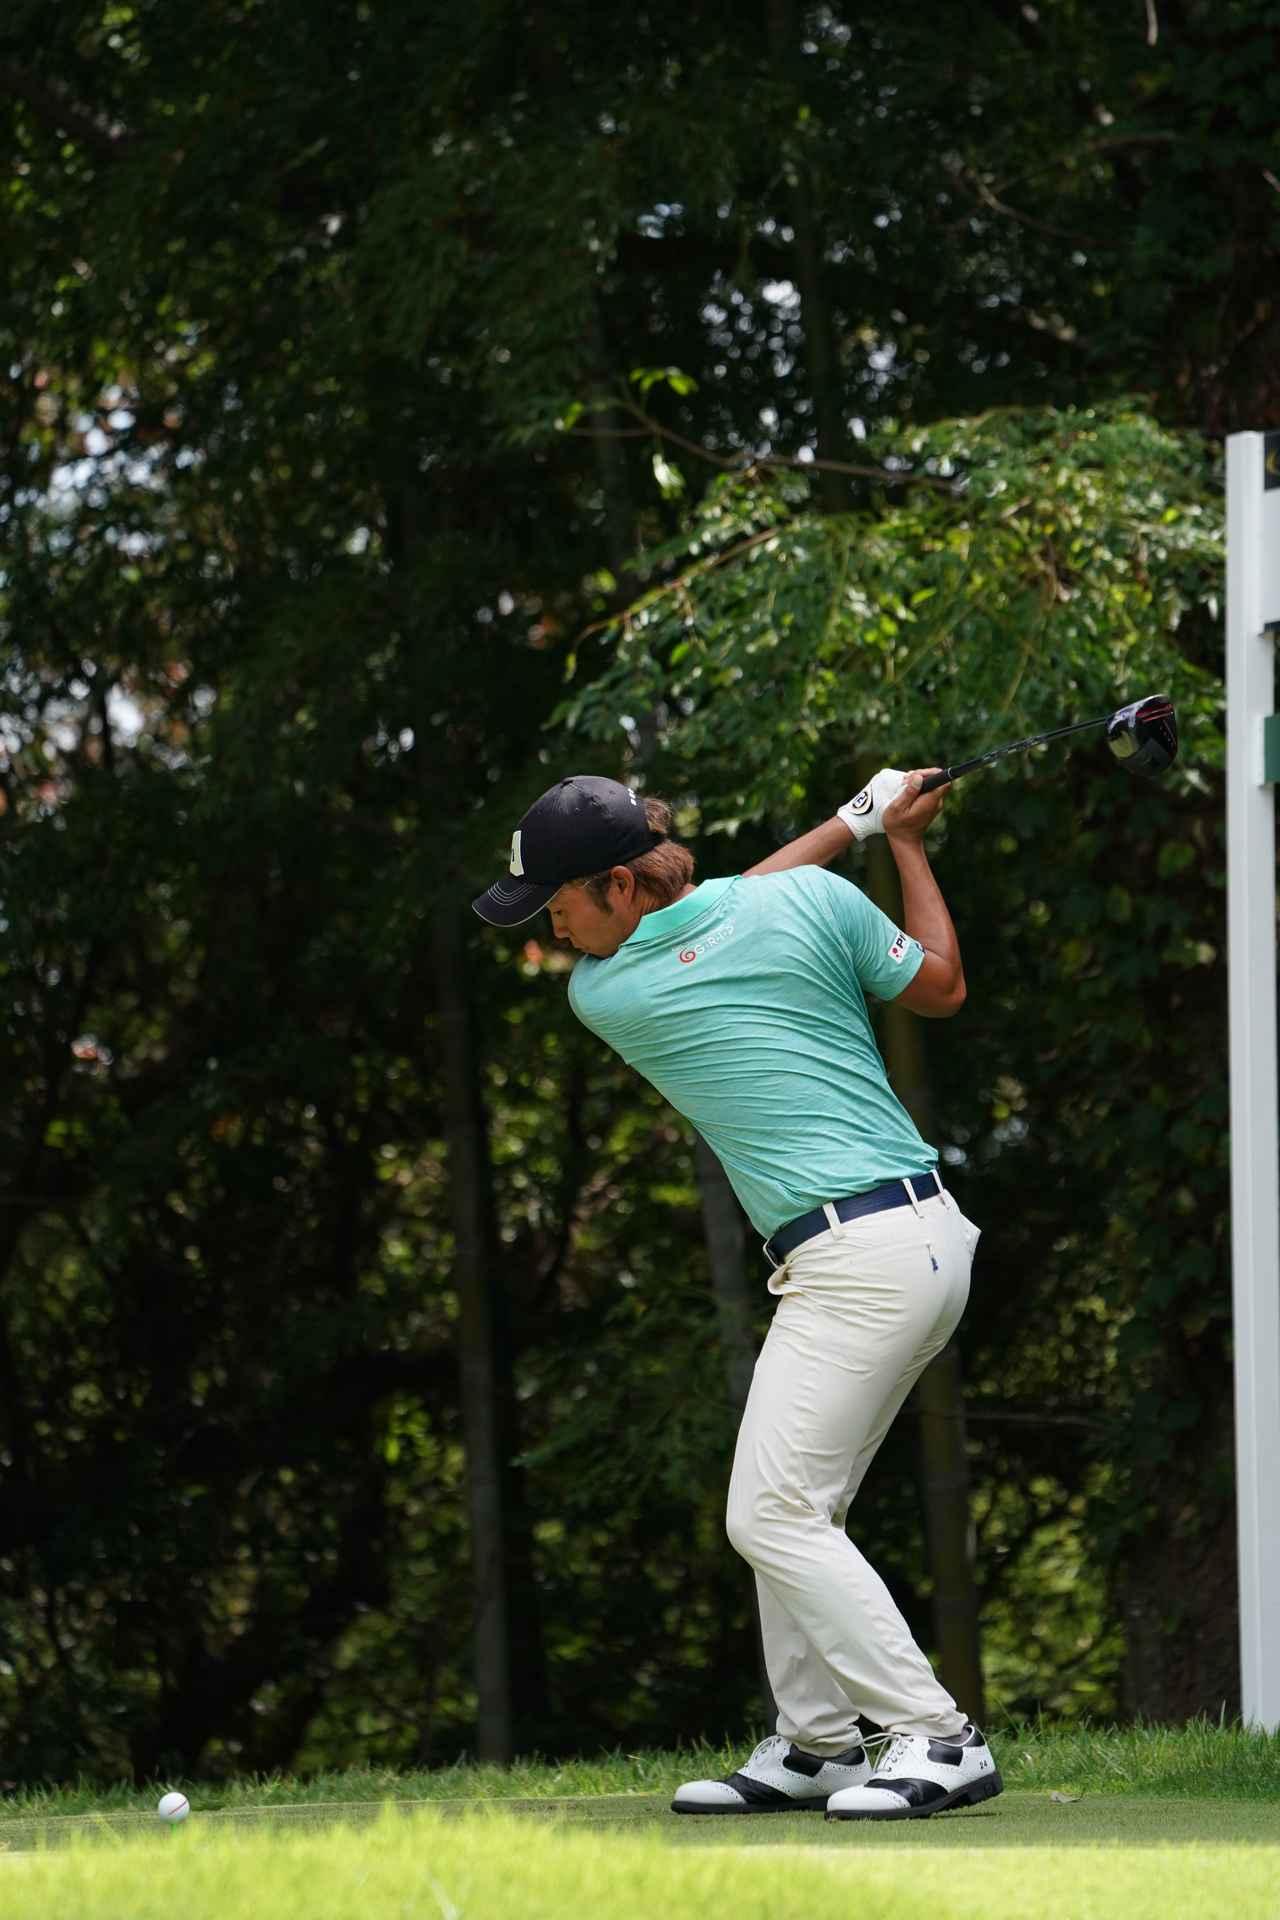 Images : 4番目の画像 - 浅地洋佑のドライバー連続写真 - みんなのゴルフダイジェスト